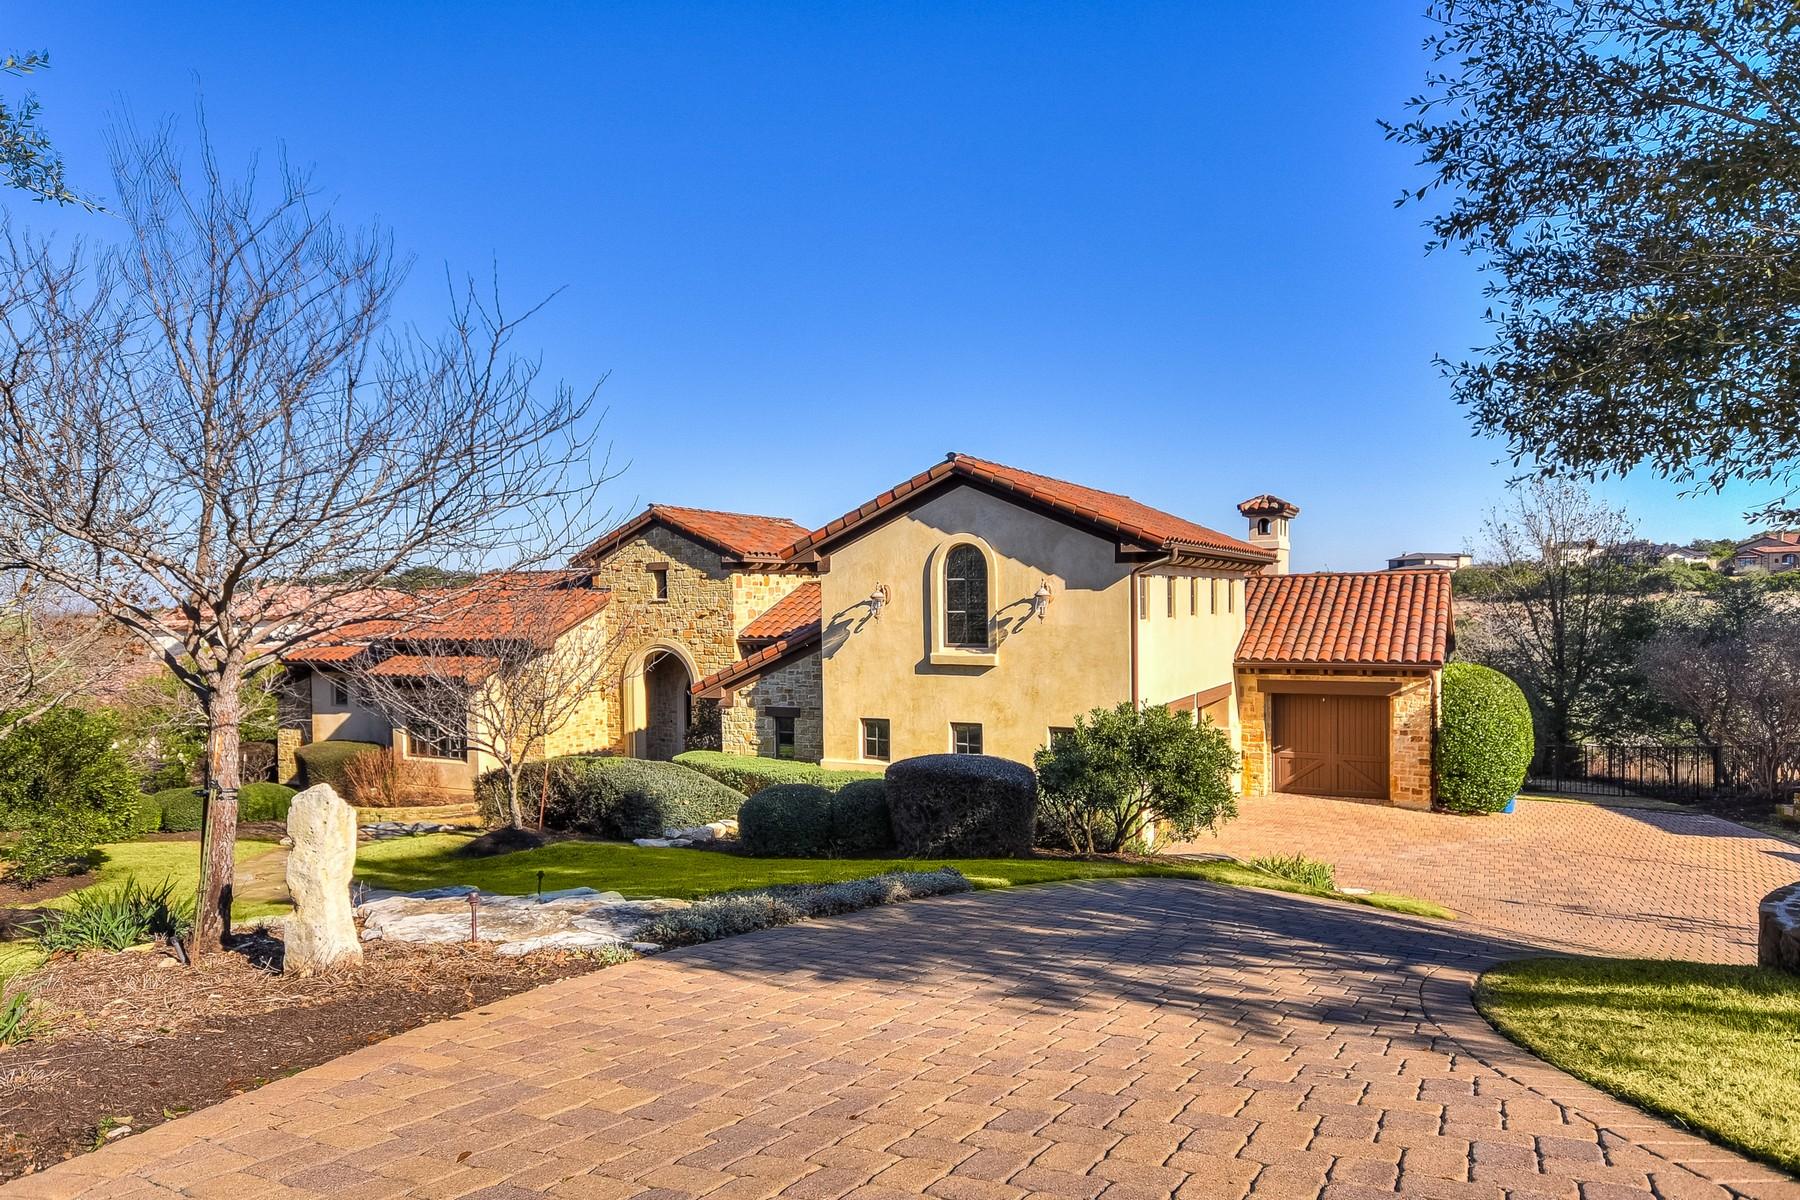 Single Family Home for Sale at Custom Built in Prestigious Spanish Oaks 5700 Spanish Oaks Club Blvd Austin, Texas 78738 United States